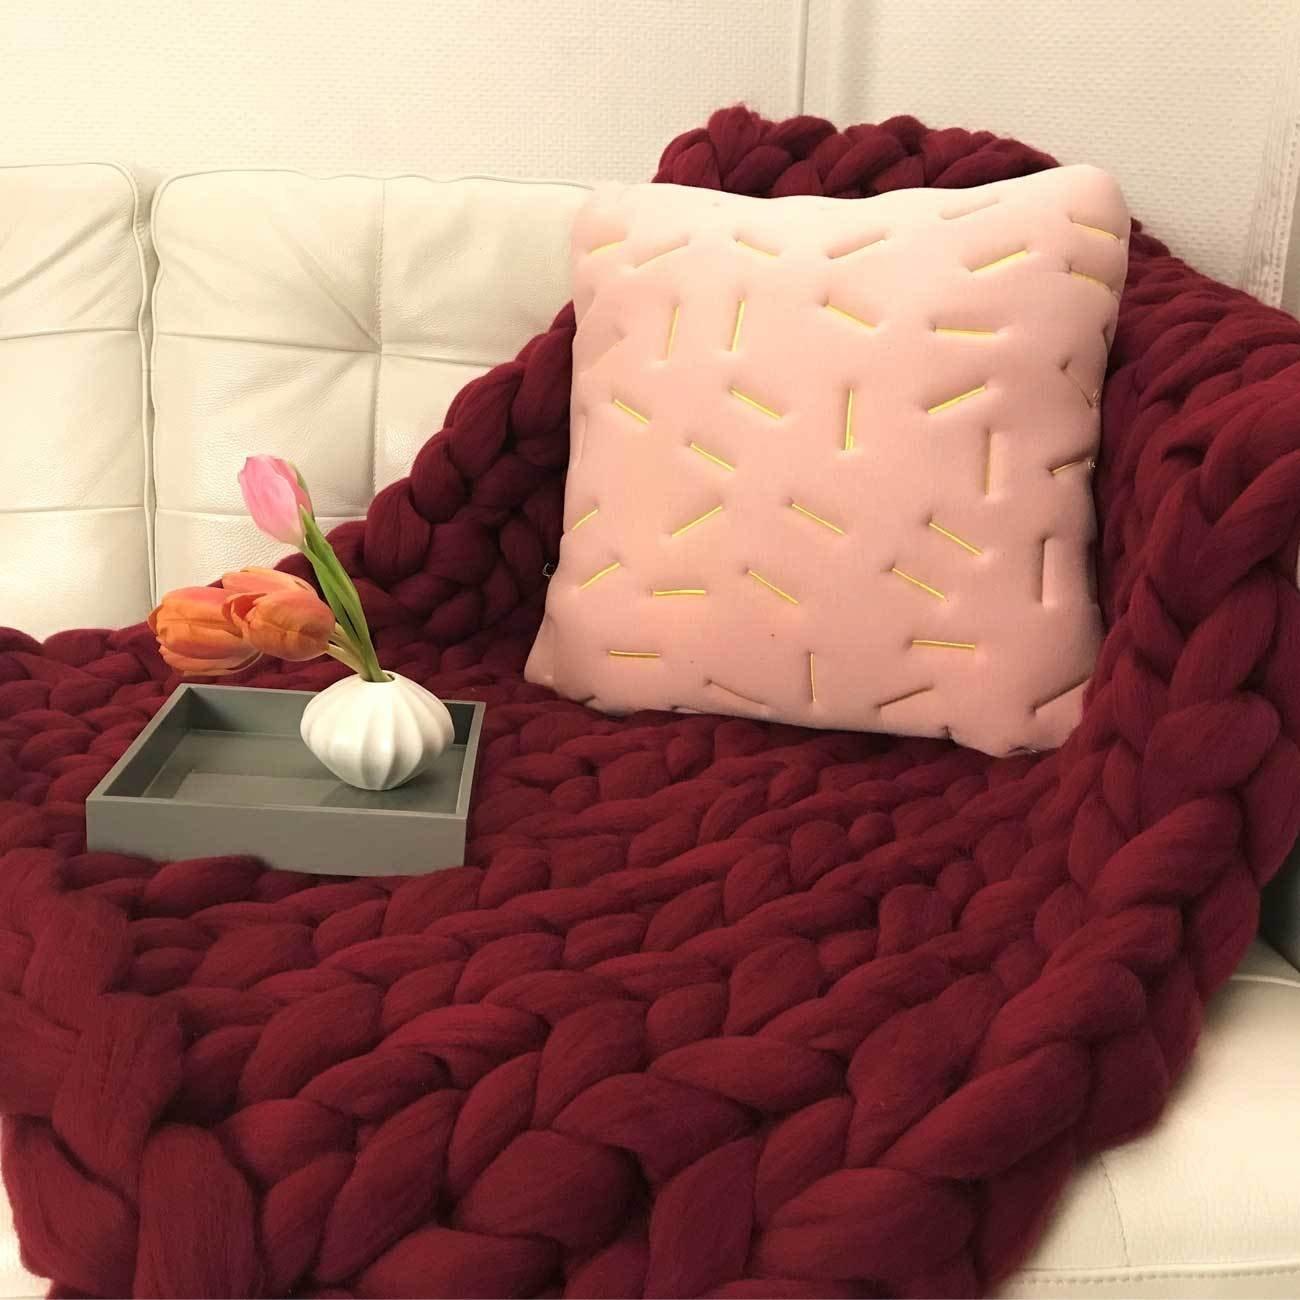 Adorist small (80x130cm) - Merino Wolldecke Cosima Chunky Knit small 80x130cm, Bordeaux rot